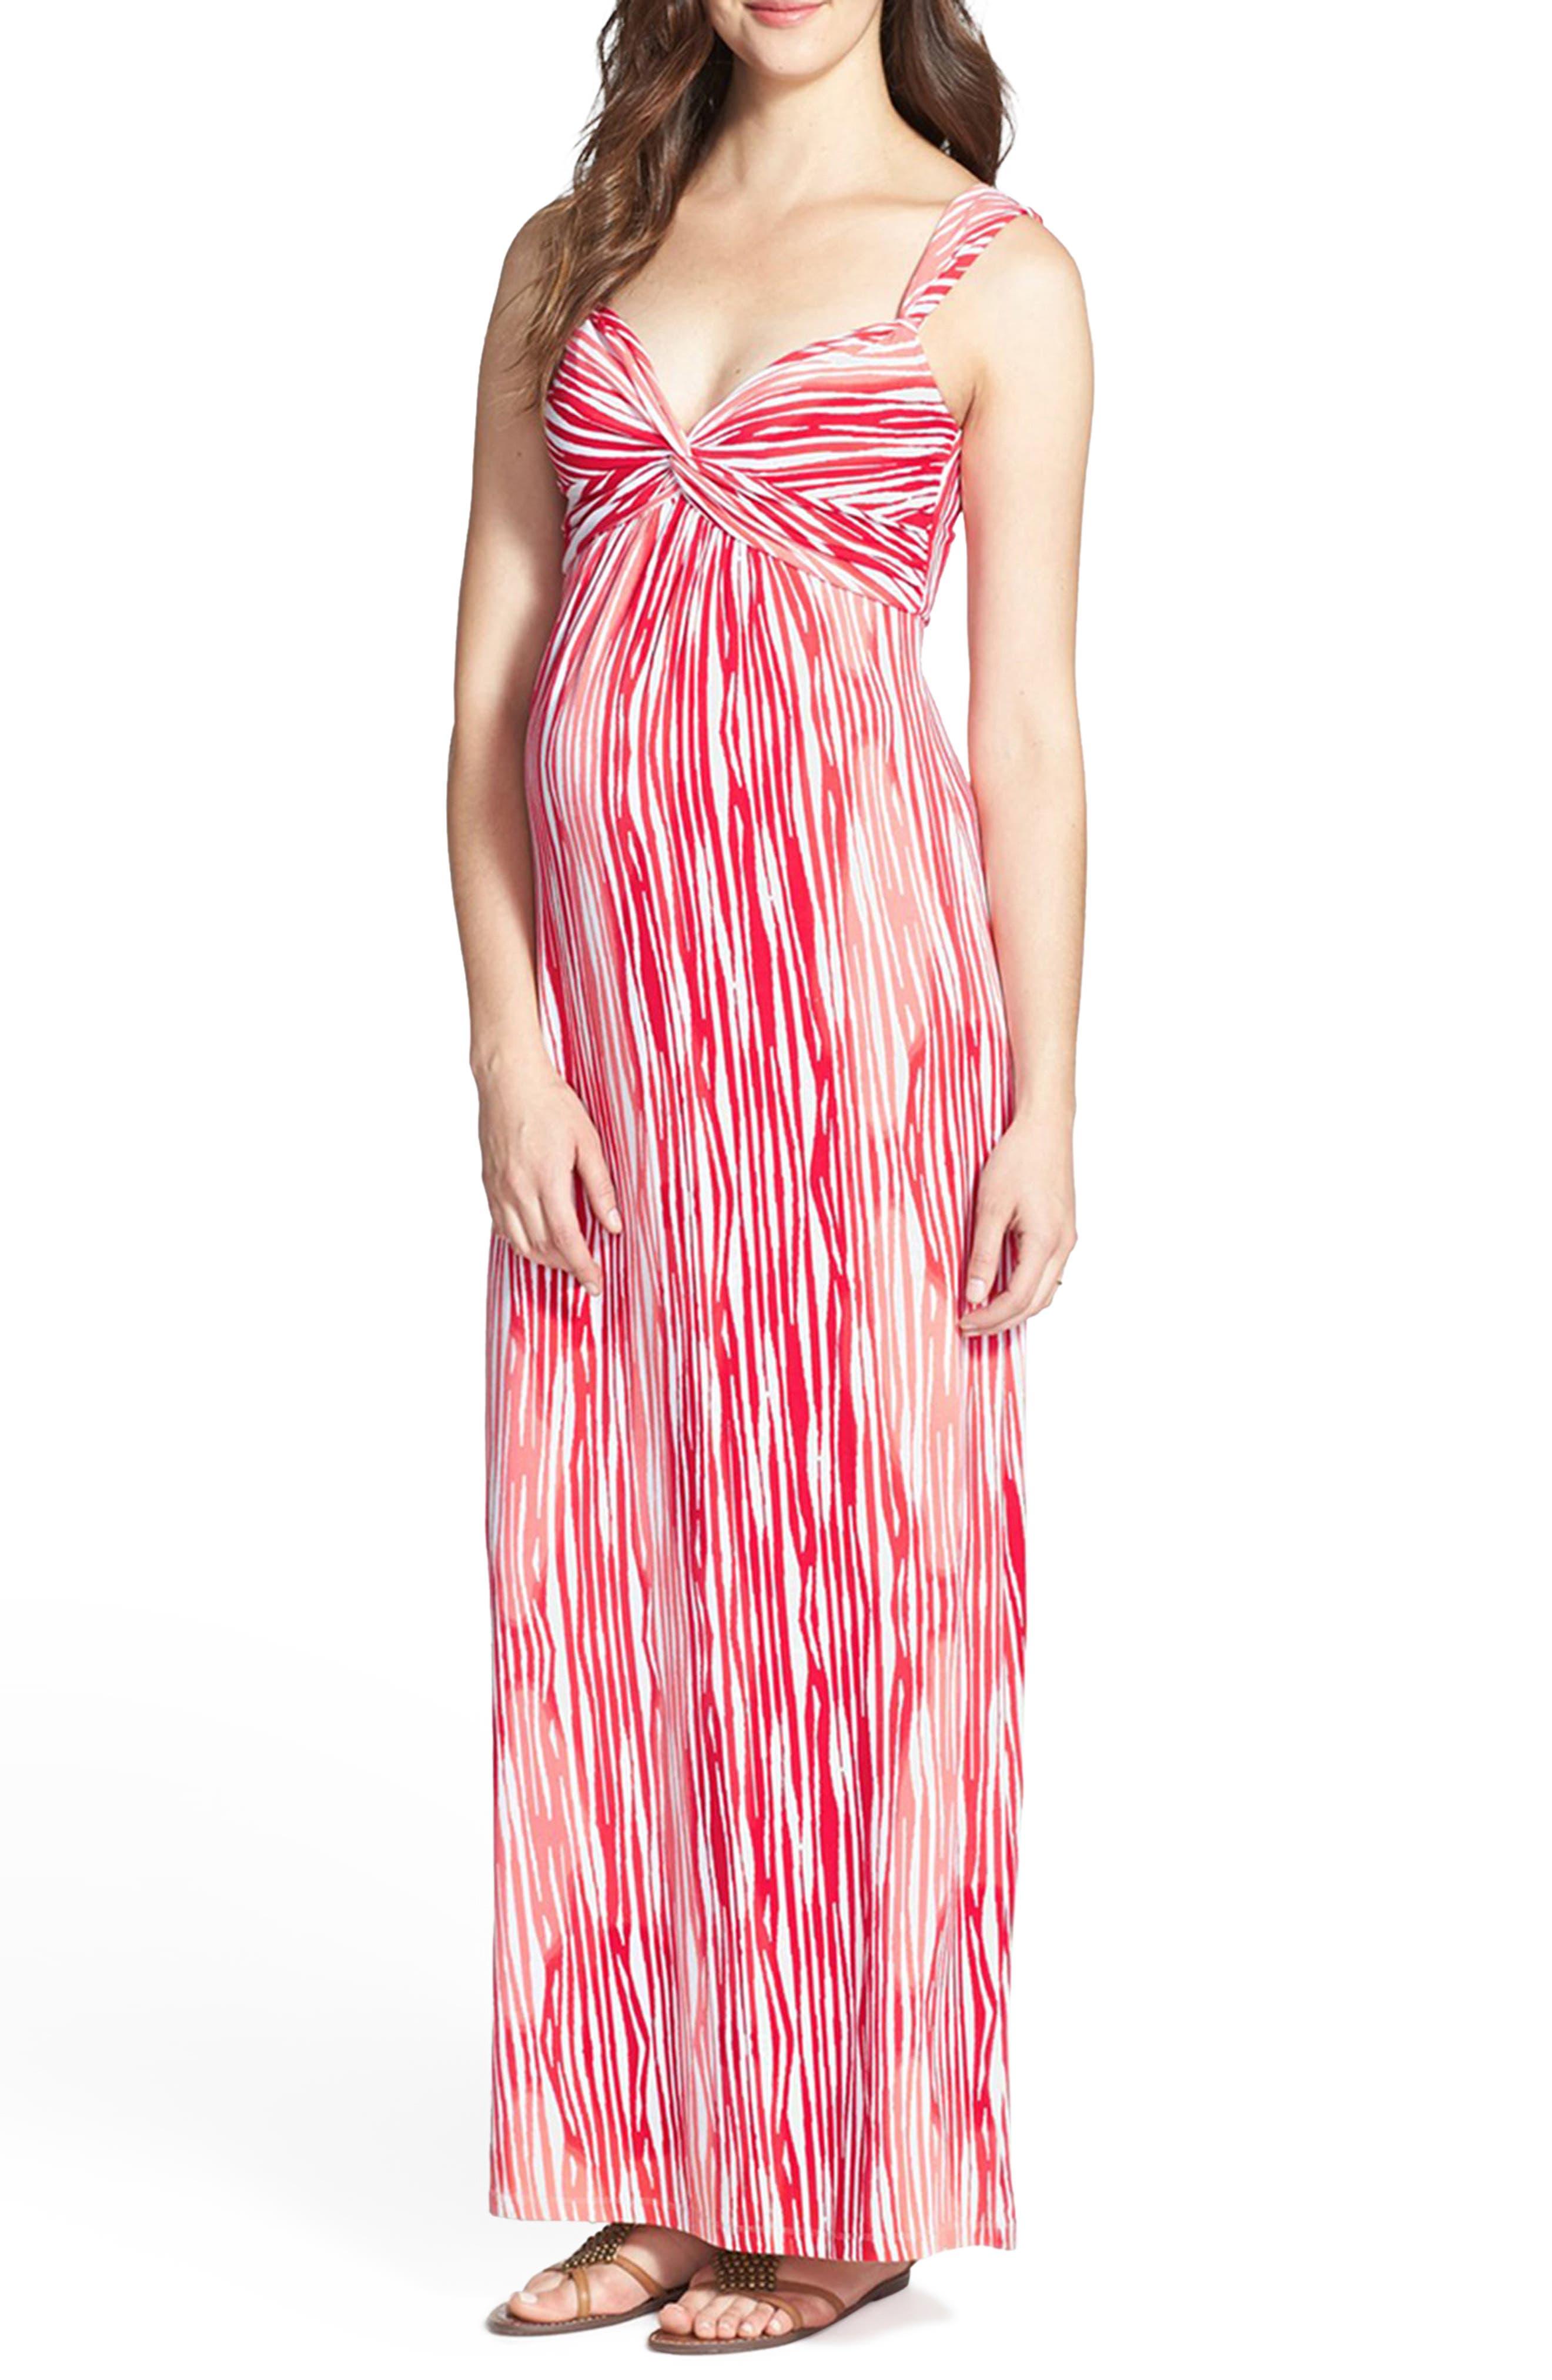 Main Image - Tart Maternity 'Callie' Jersey Maxi Maternity Dress